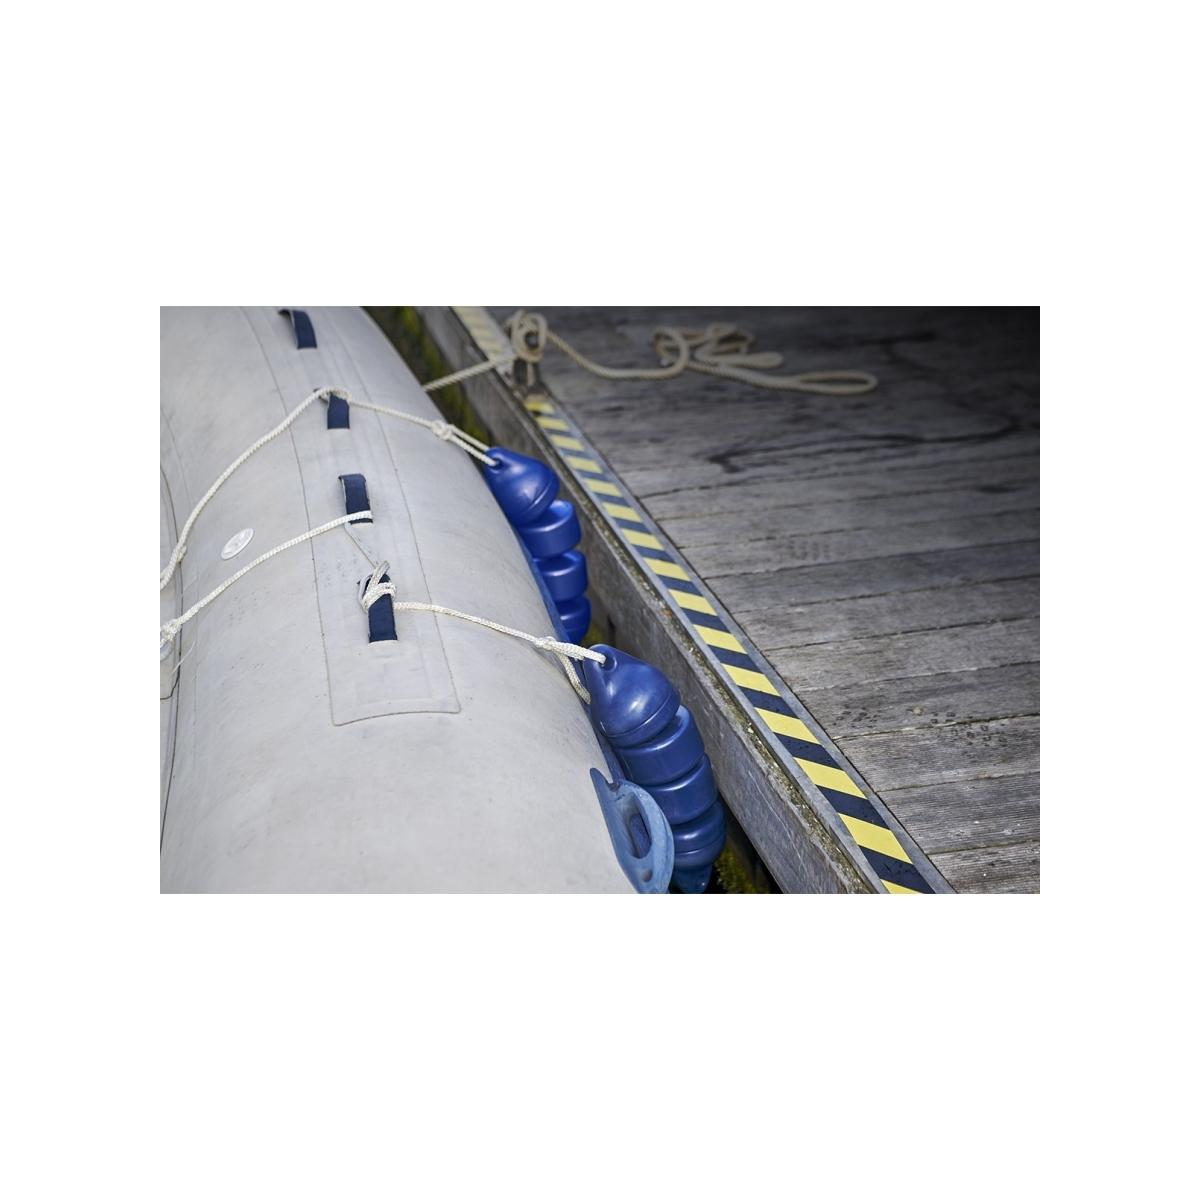 Articulated RIB fender